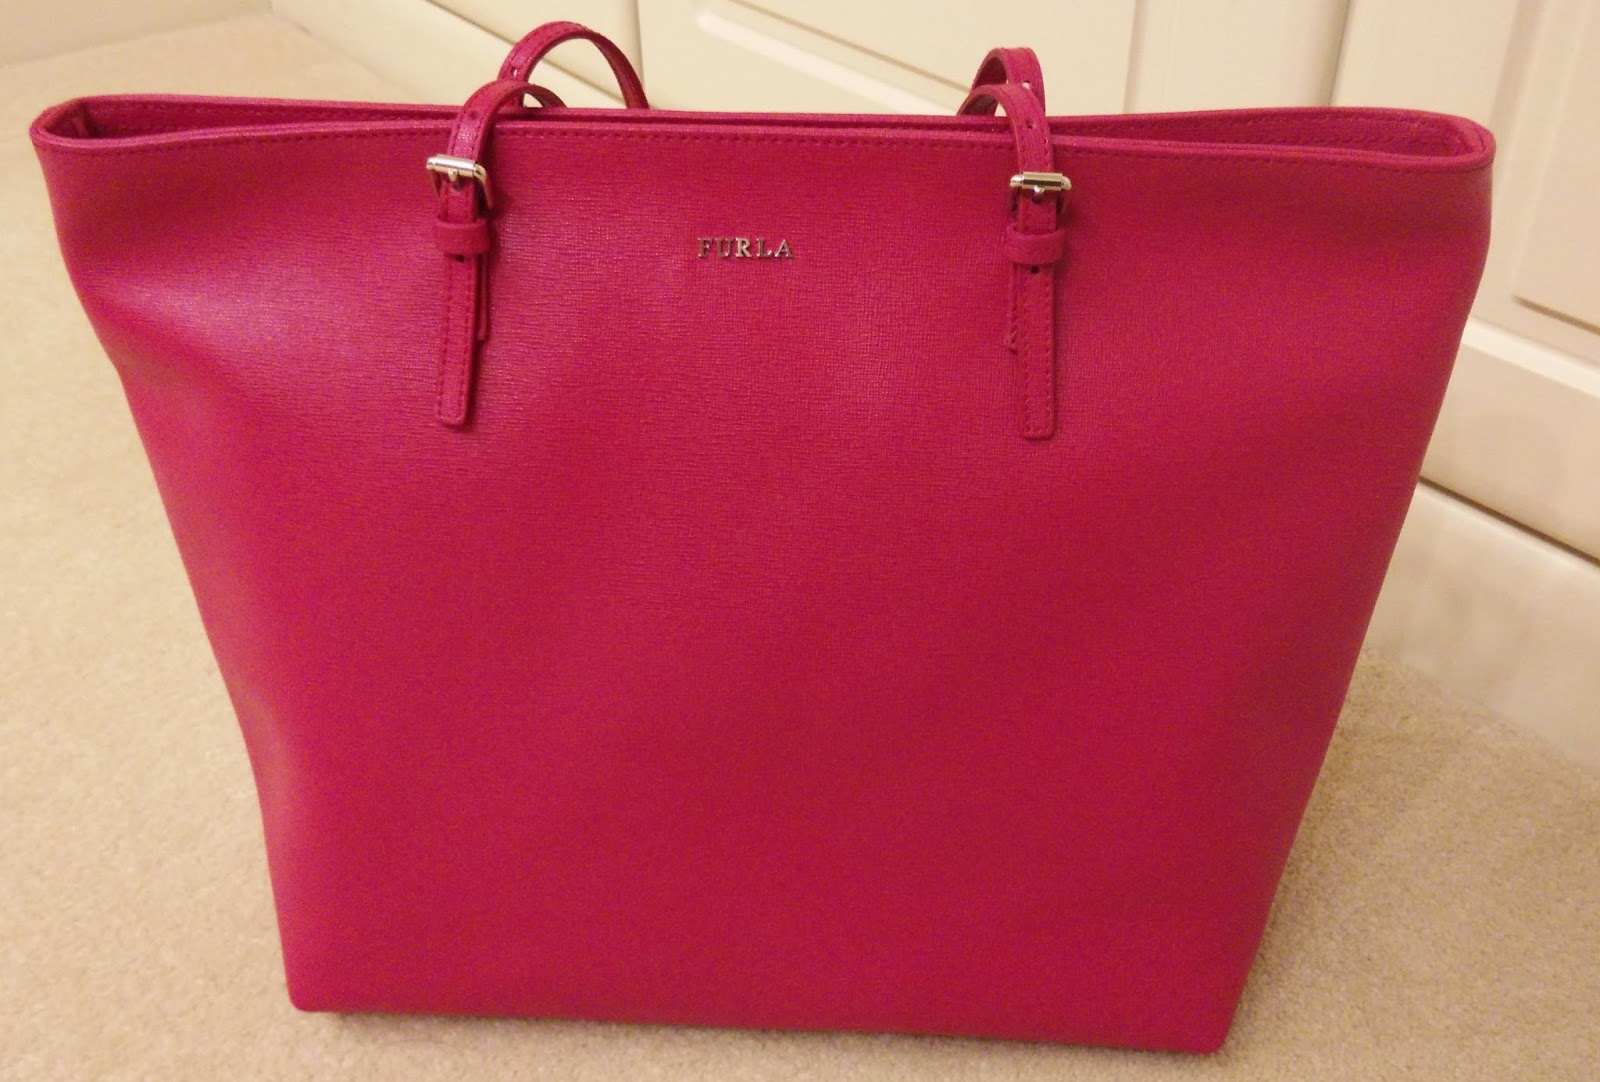 Cheshire Oaks Outlet Furla New Bag